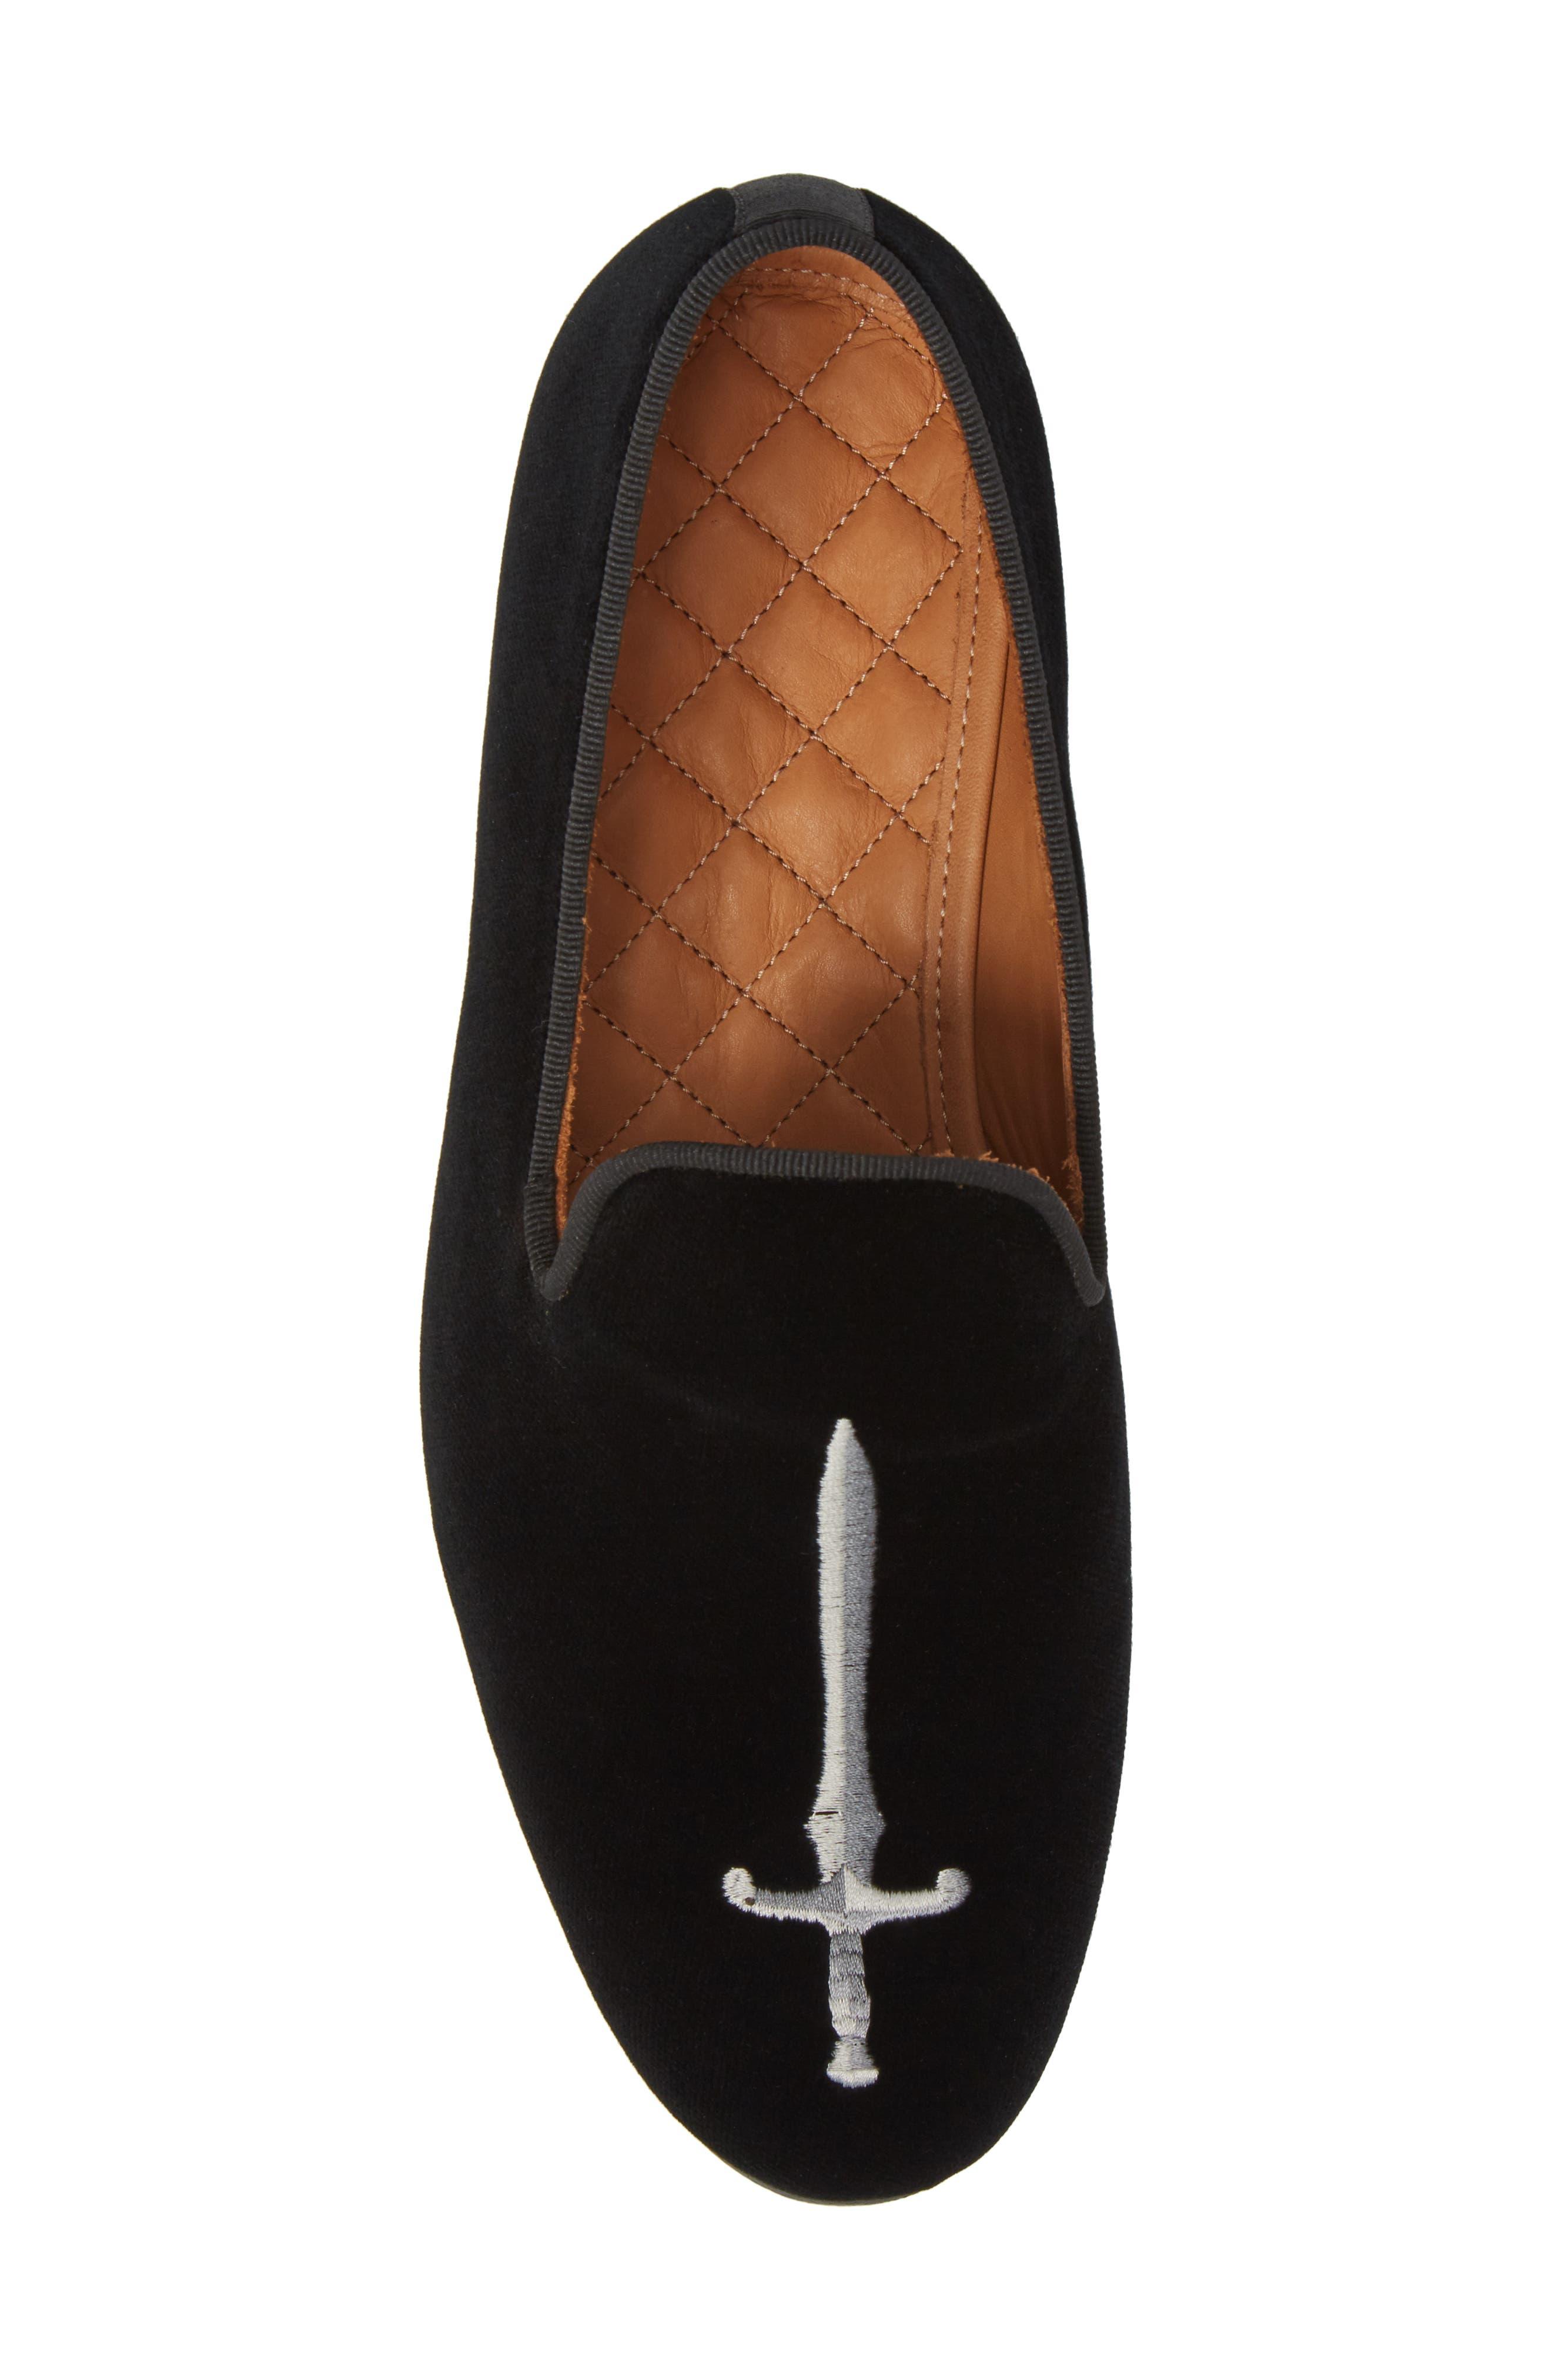 Bravi 2 Loafer,                             Alternate thumbnail 5, color,                             BLACK LEATHER